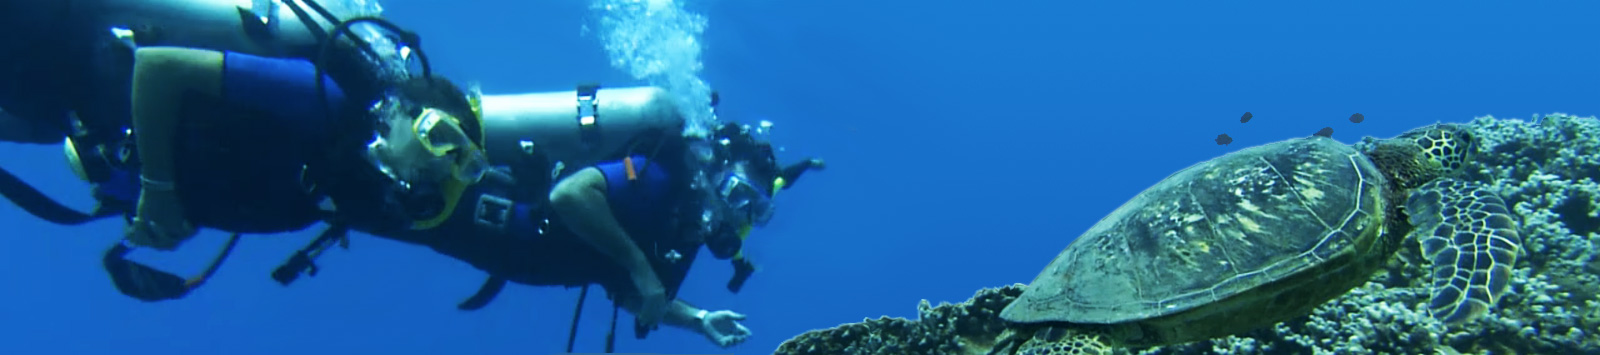 scuba-cruise-featured-bg